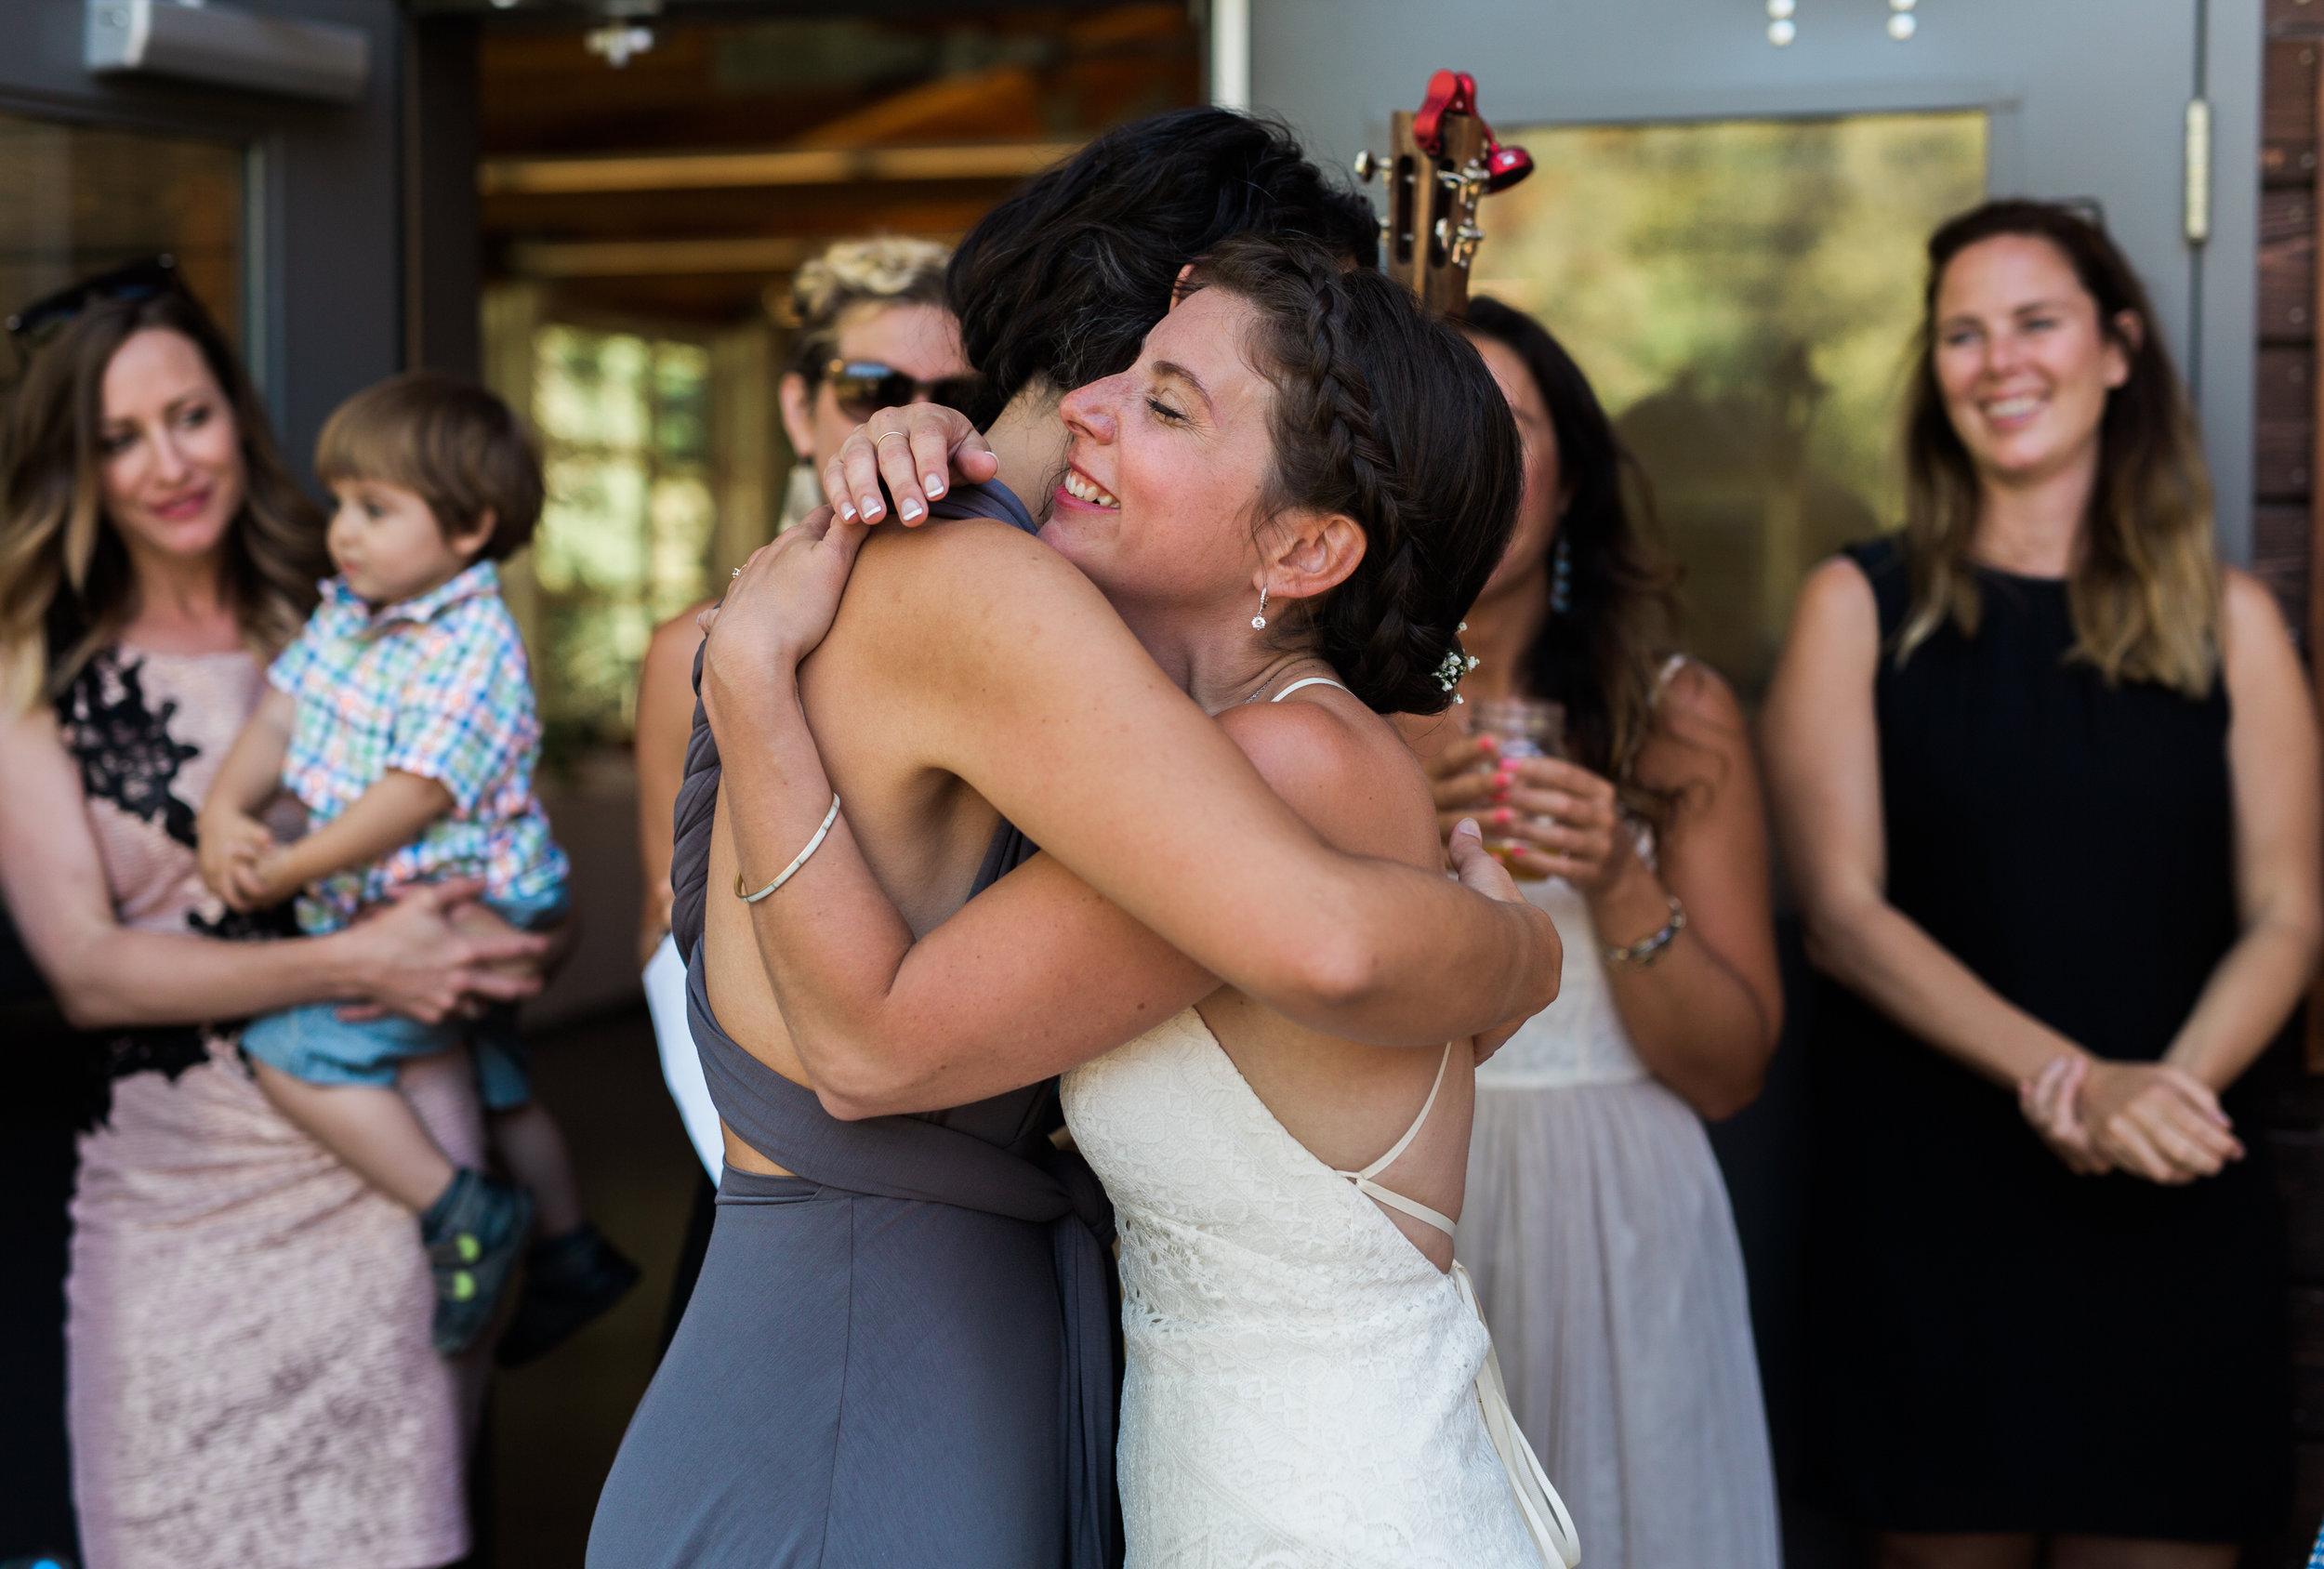 Camp Fircom Wedding - Vancouver Wedding Photographer & Videographer - Sunshine Coast Wedding Photos - Sunshine Coast Wedding Photographer - Jennifer Picard Photography - IMG_0375.jpg